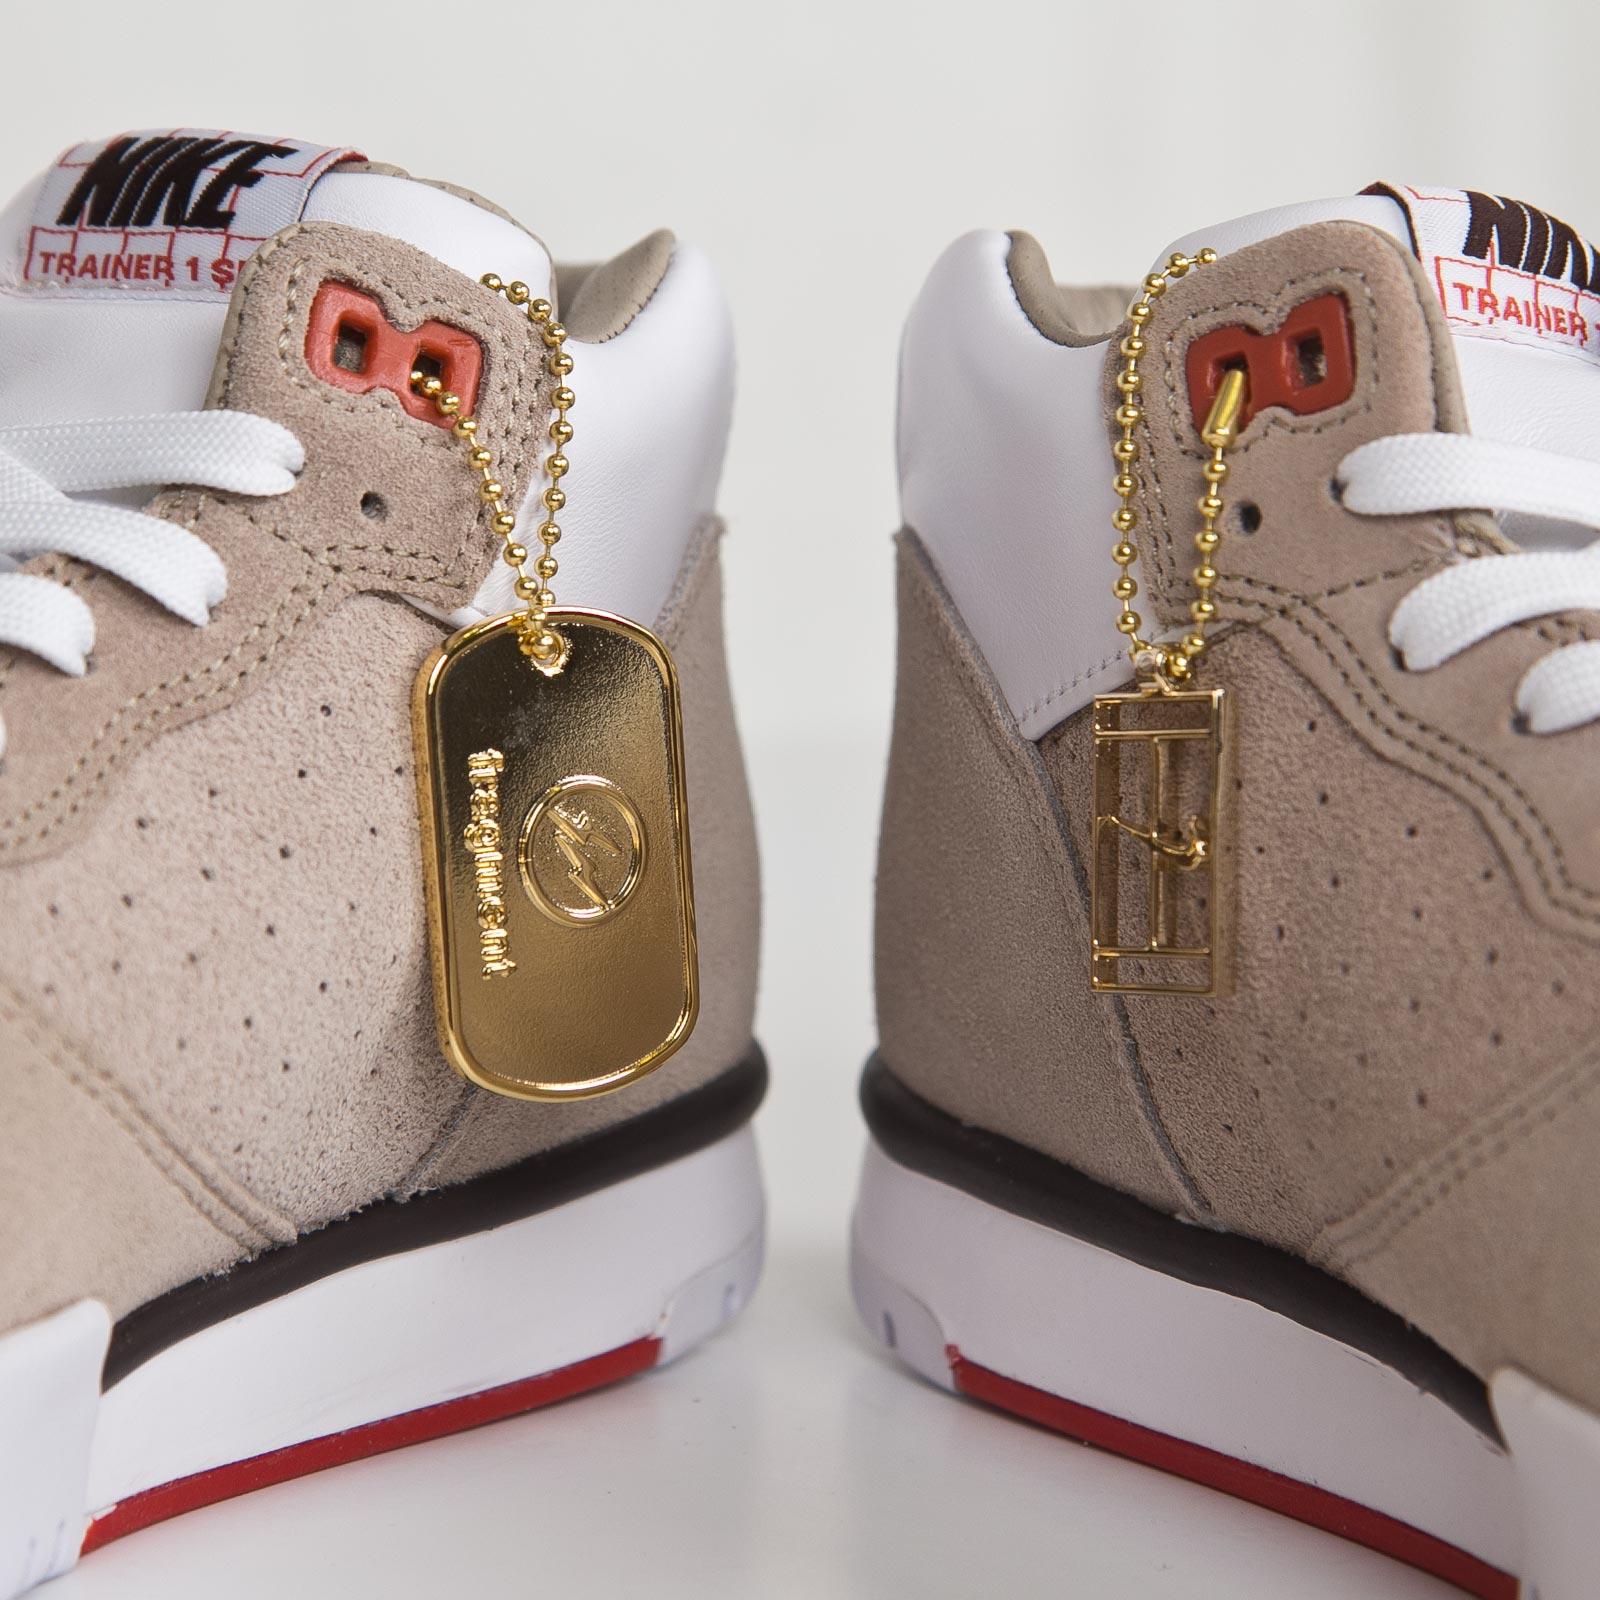 get cheap f8182 96887 Nike Air Trainer 1 Mid SP   Fragment - 806942-282 - Sneakersnstuff    sneakers   streetwear online since 1999